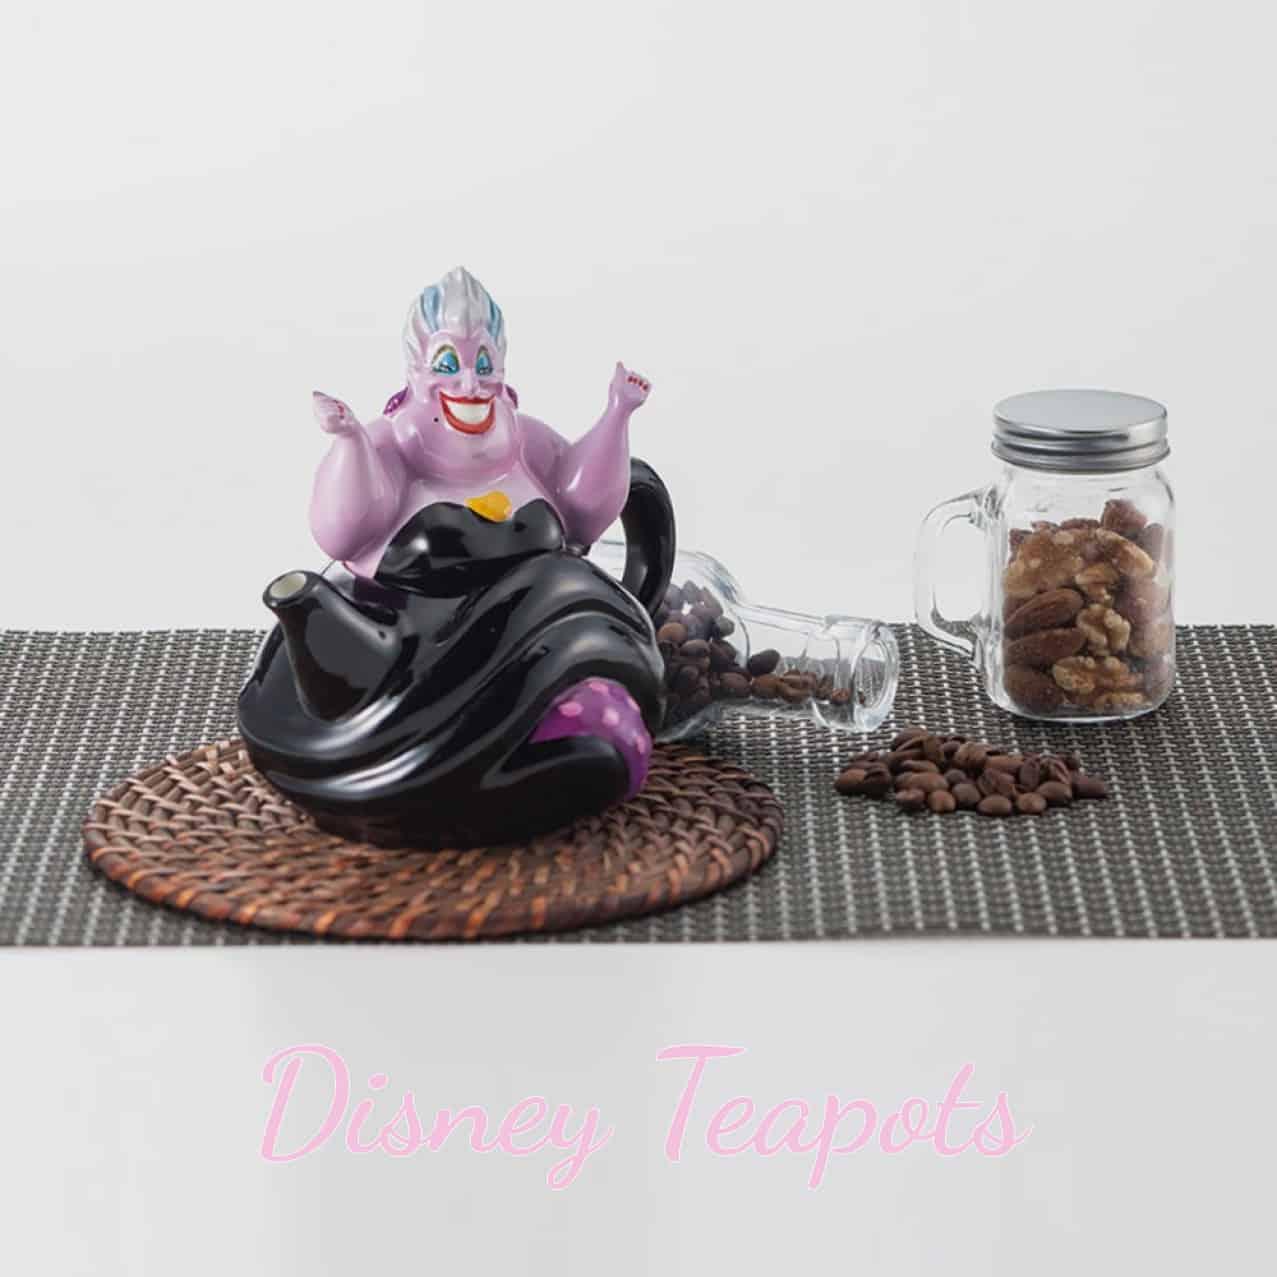 Disney Teapots